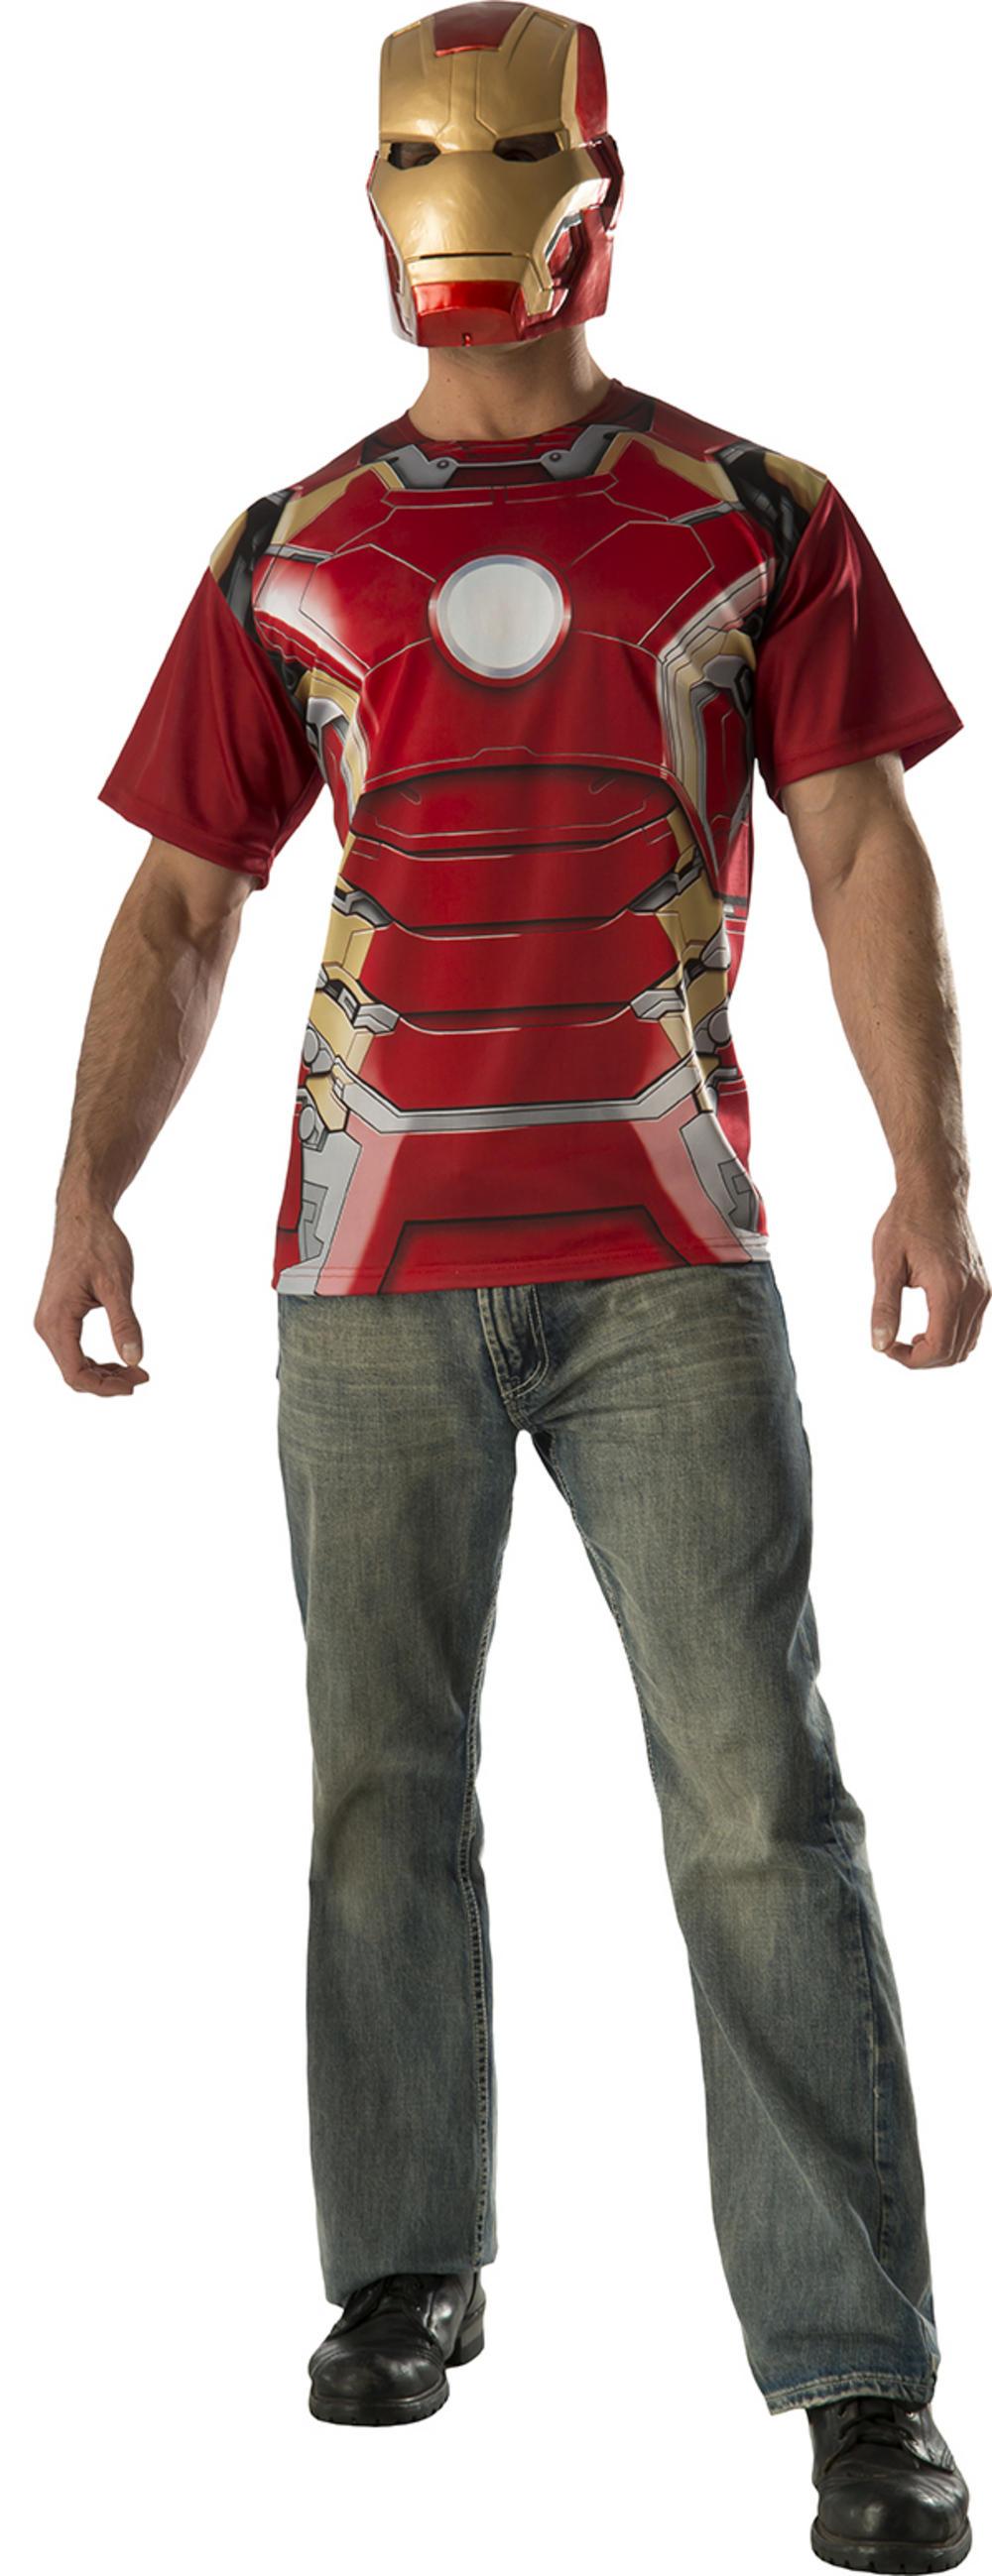 Iron Man Mark T-Shirt and Mask